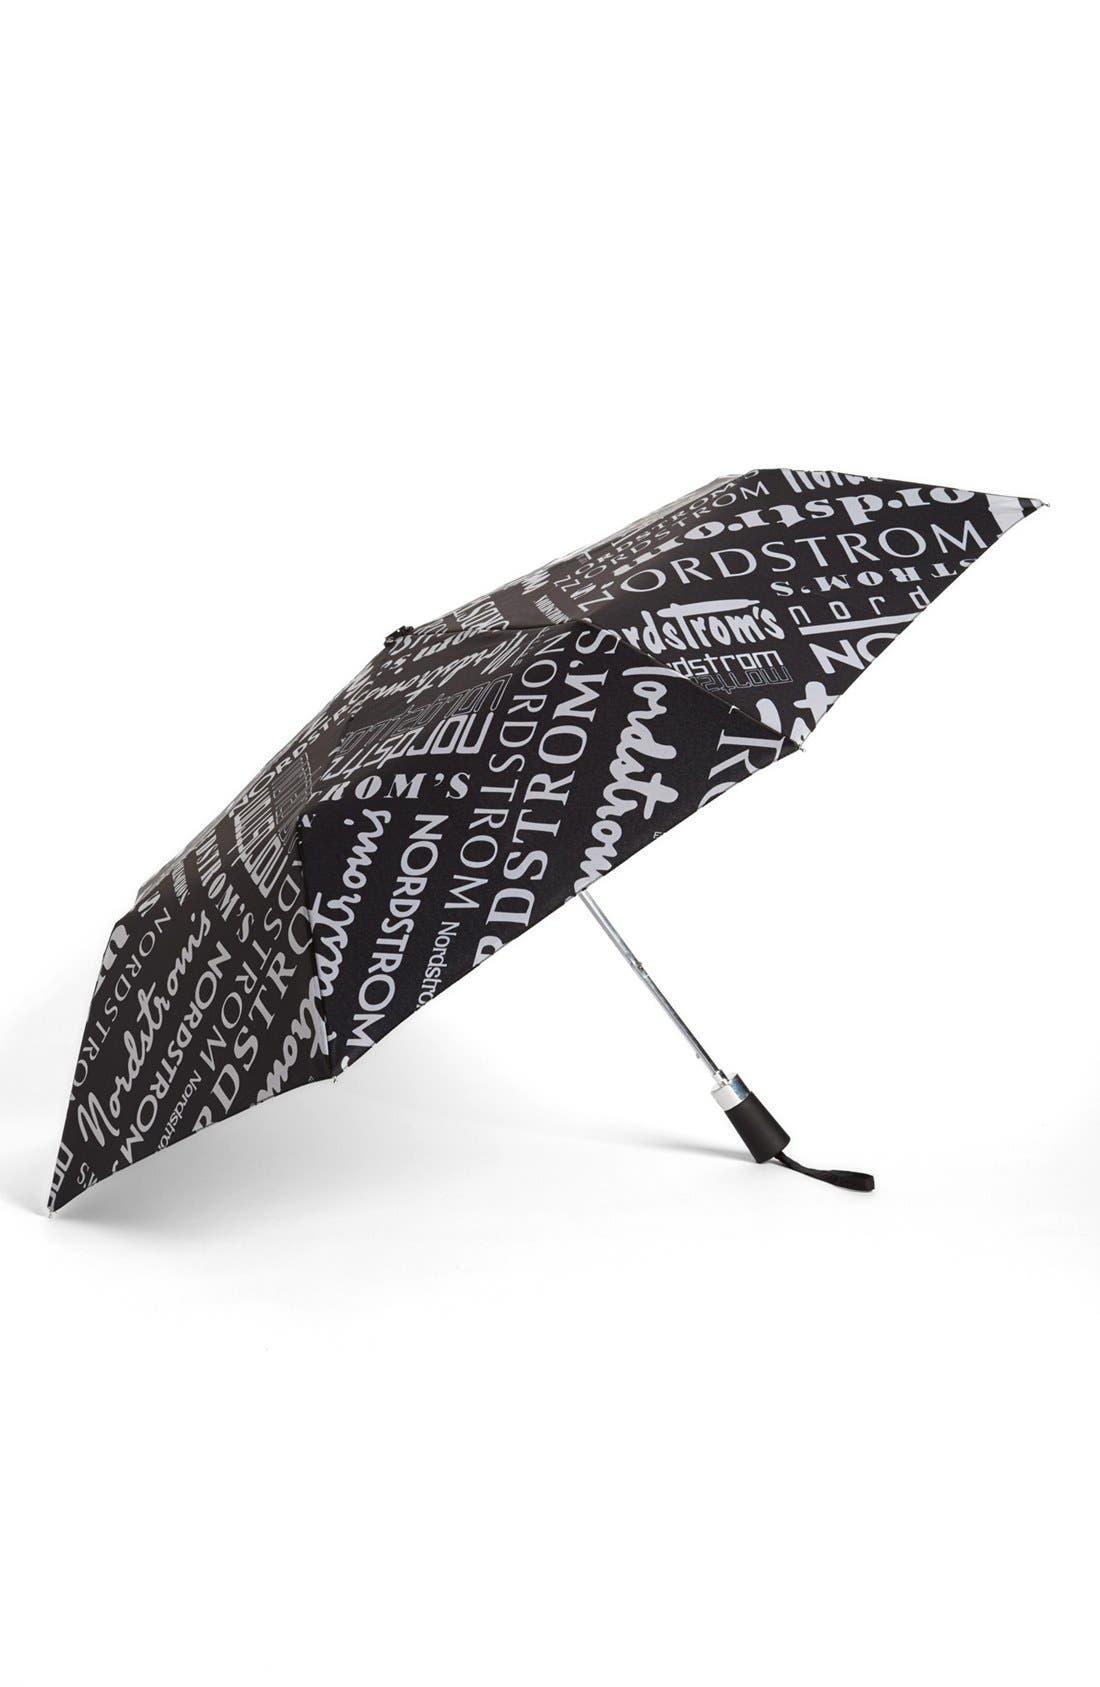 Main Image - Nordstrom 'Heritage' Umbrella